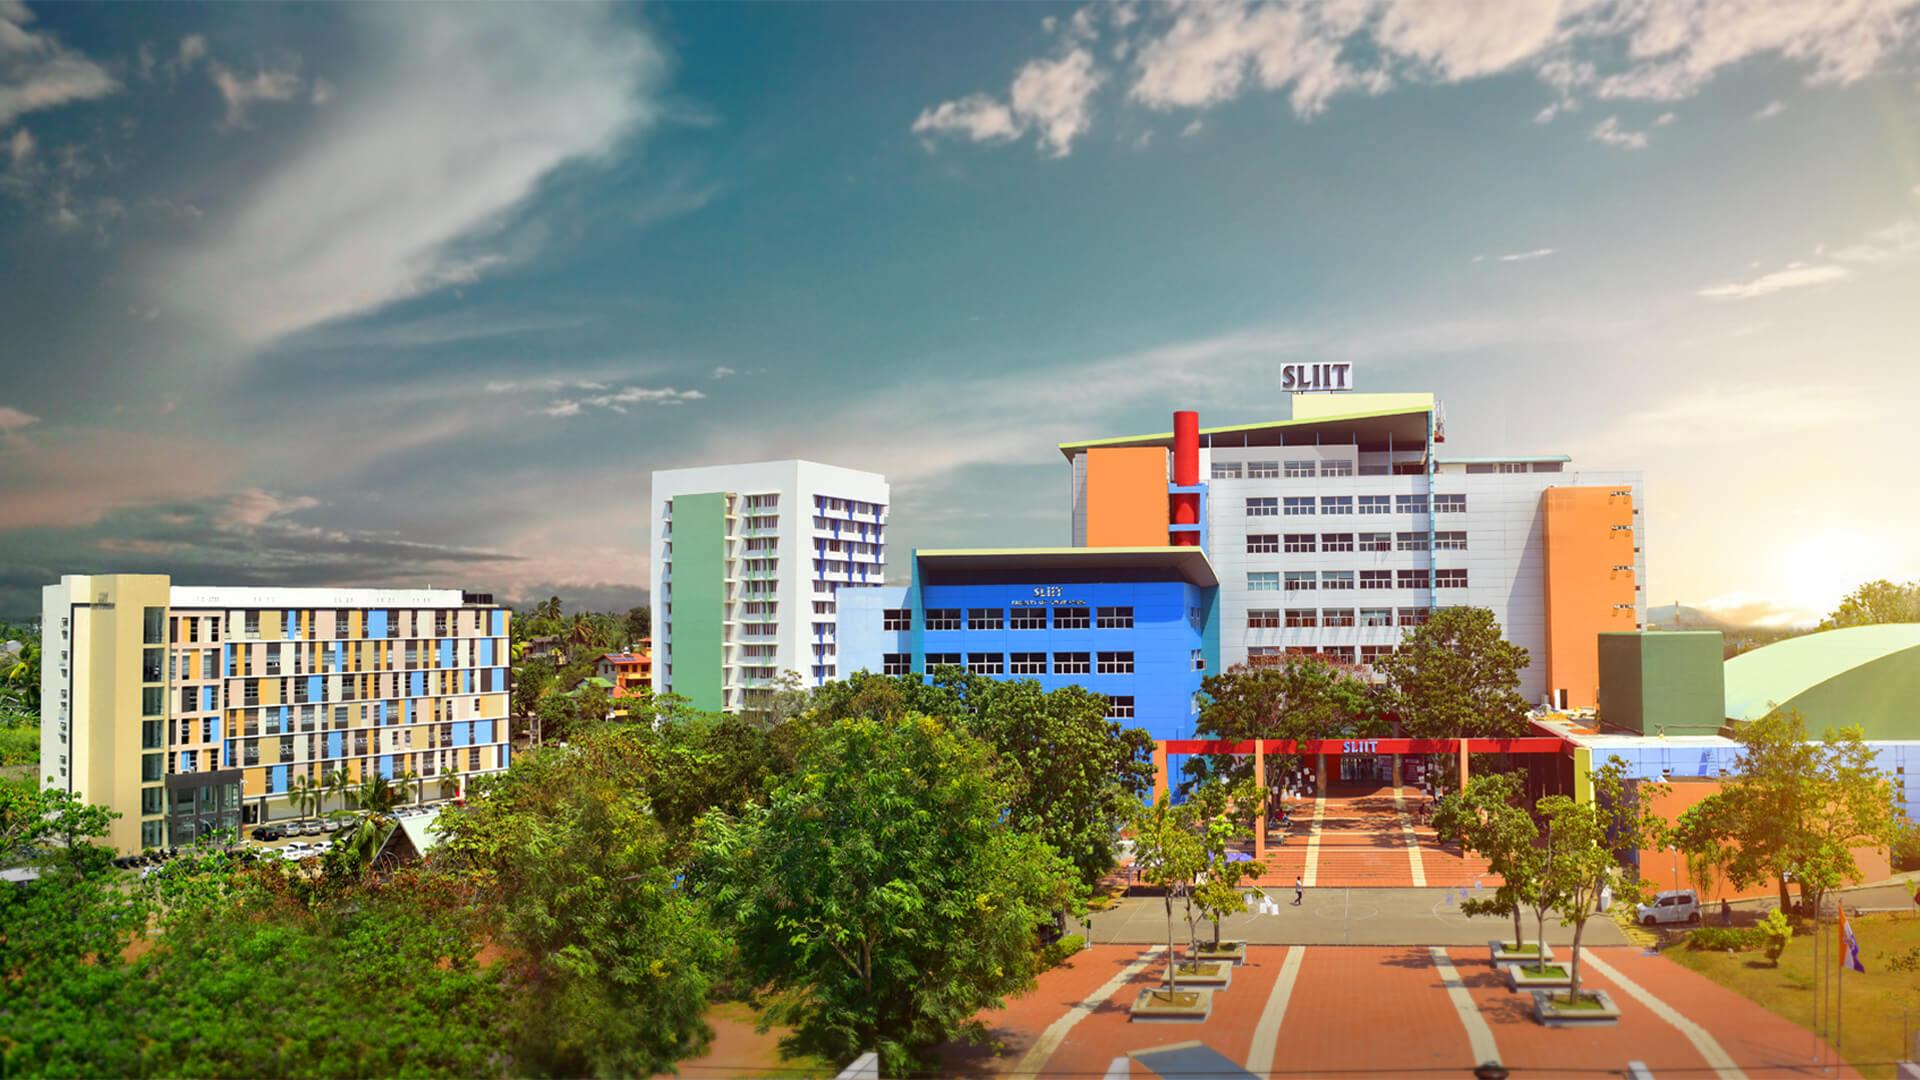 SLIIT Malabe Campus Photo